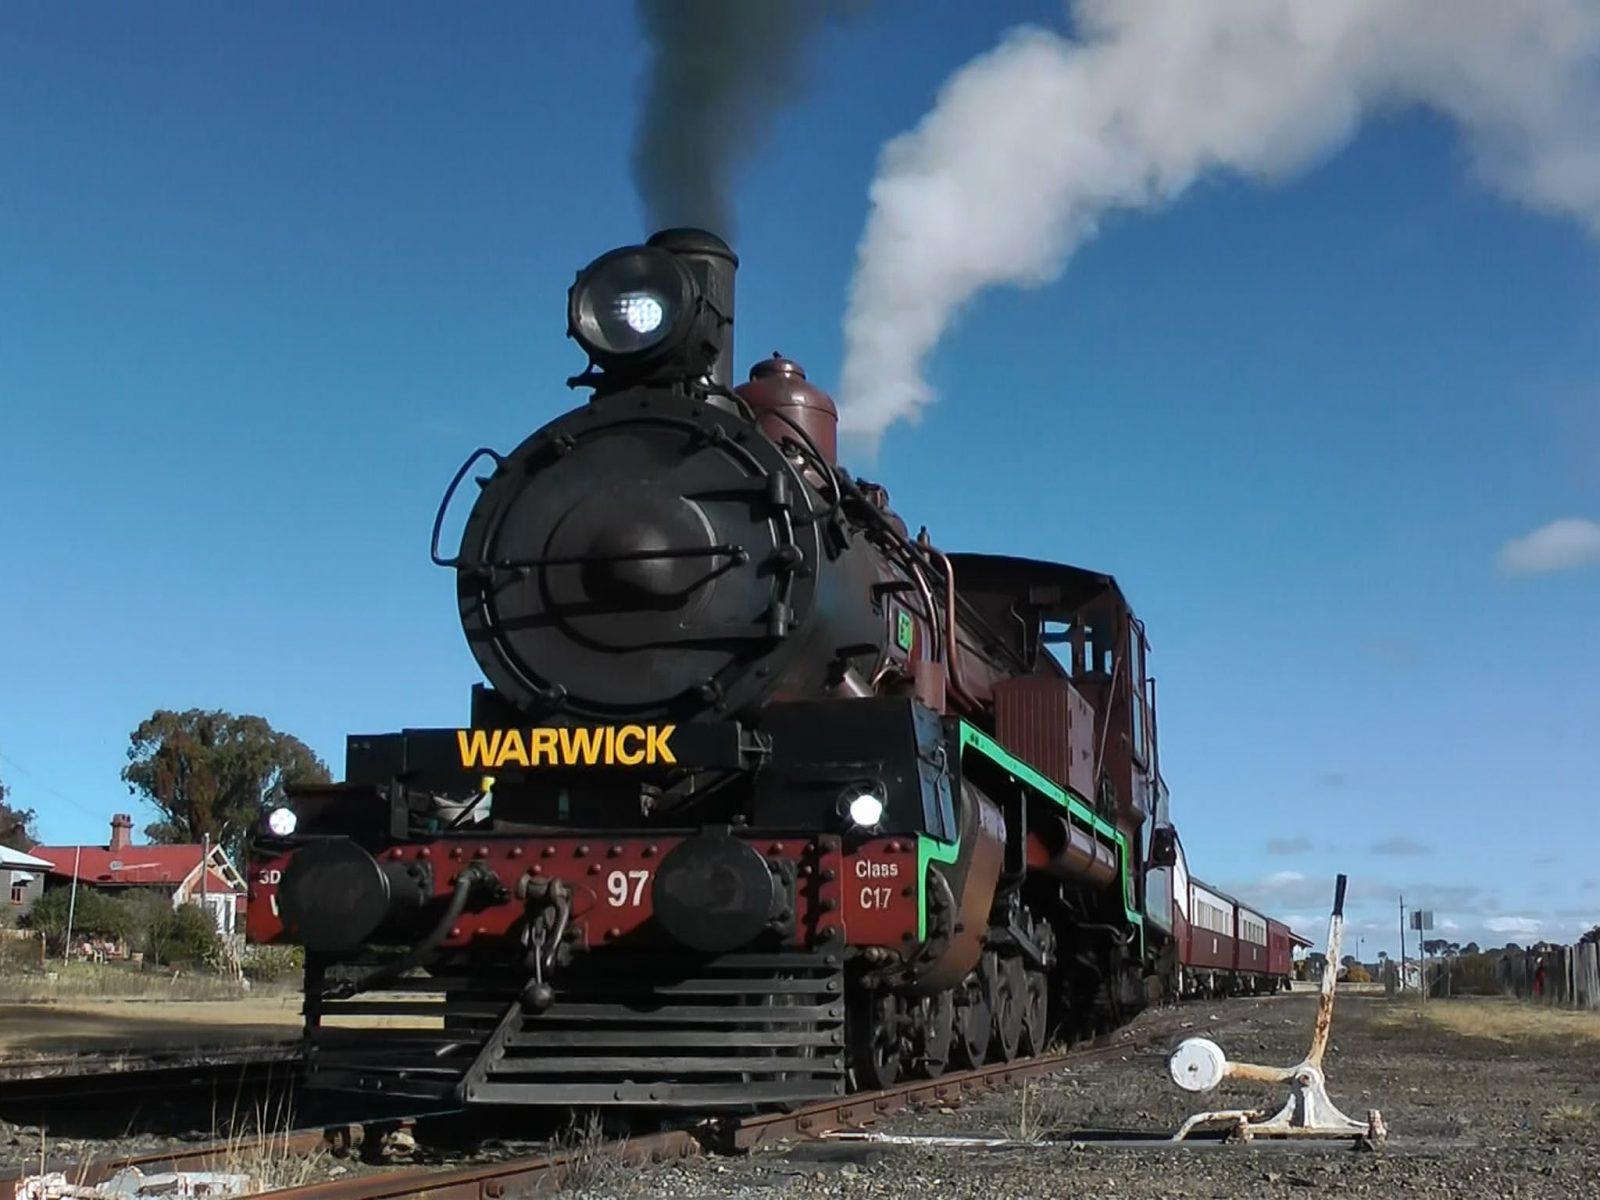 back to Warwick